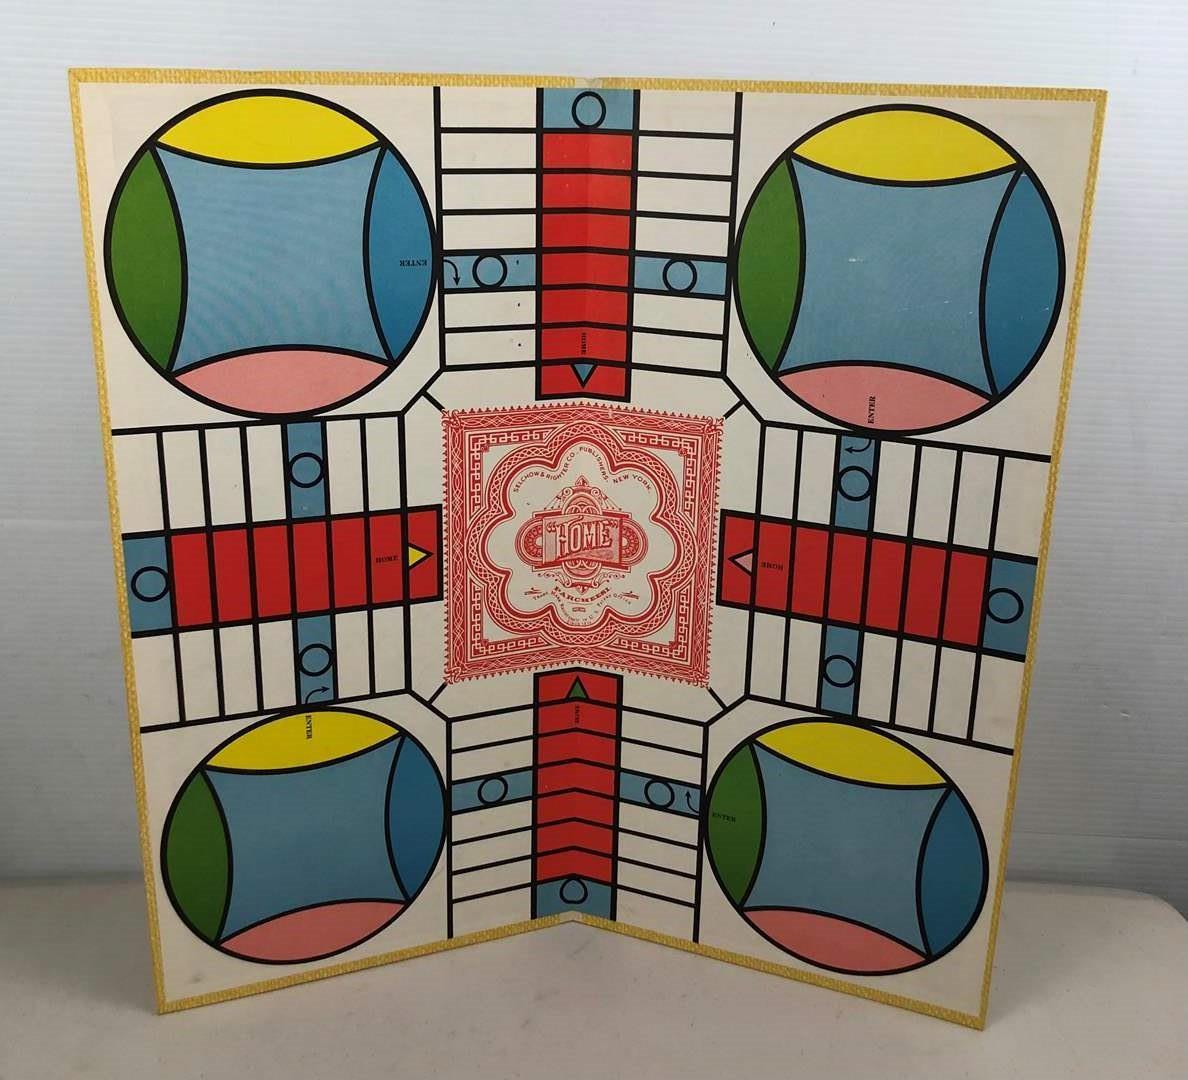 Lot # 220 1975 Parcheesi Board Game (main image)